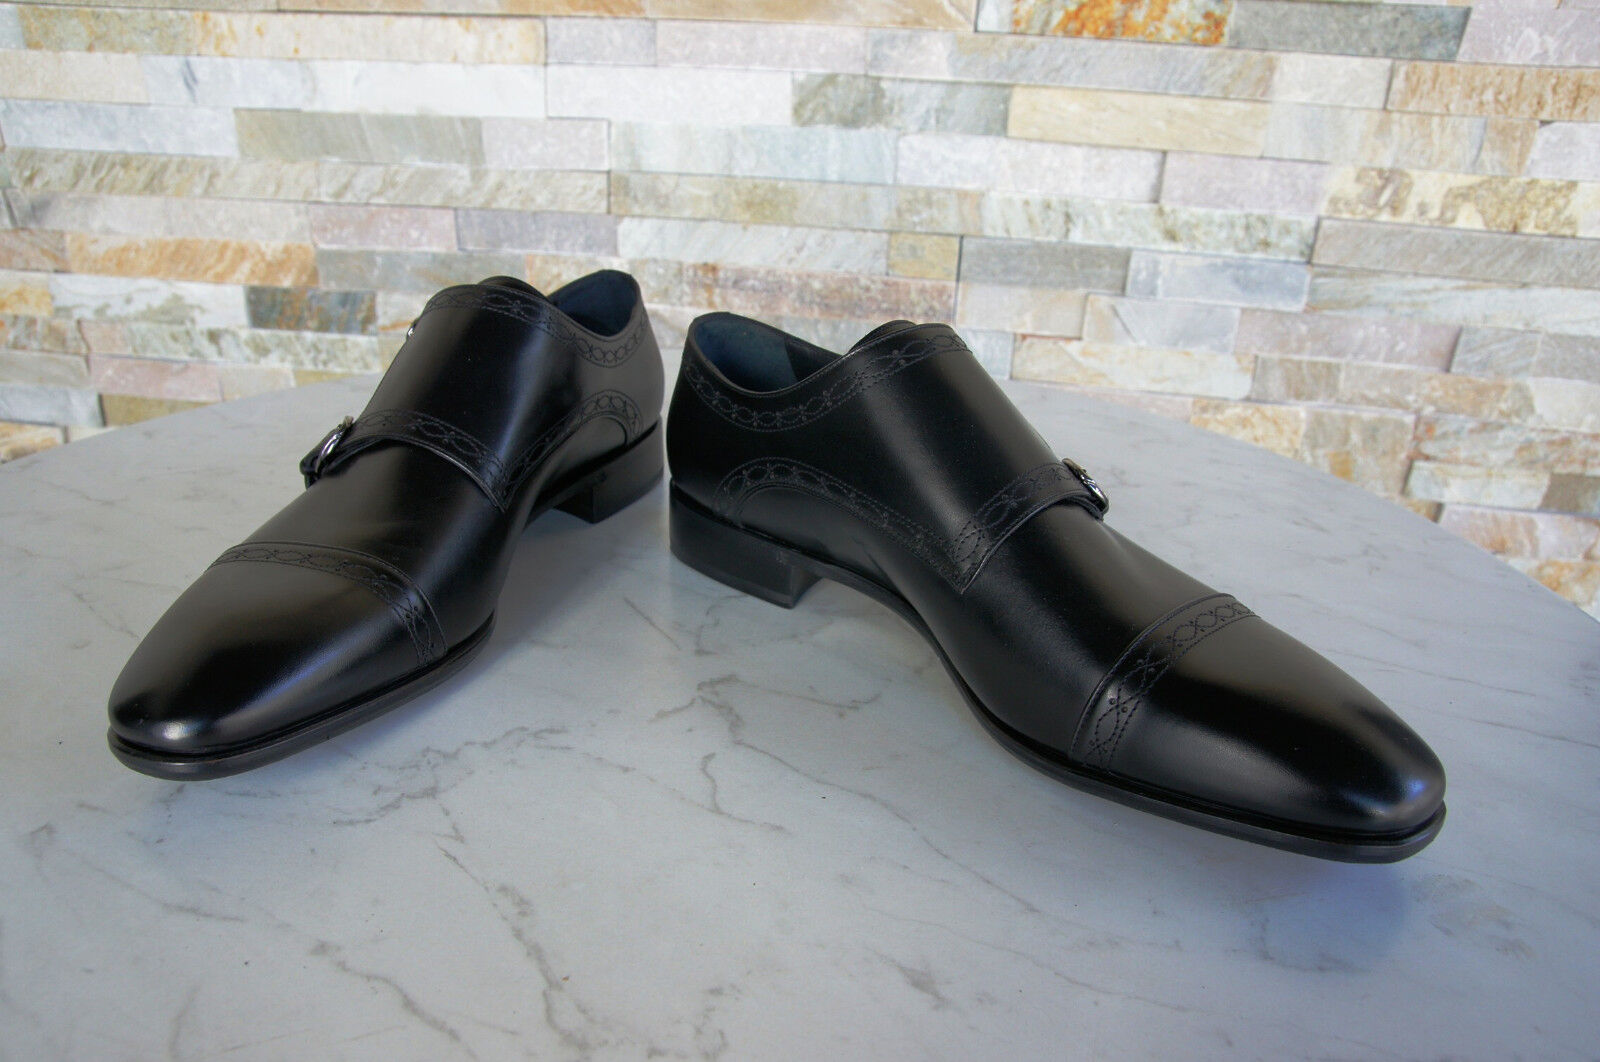 Roberto Cavalli TAGLIA 41,5 Slipper Slipper Slipper Business Scarpe Basse Scarpe nero NUOVO UVP b98107